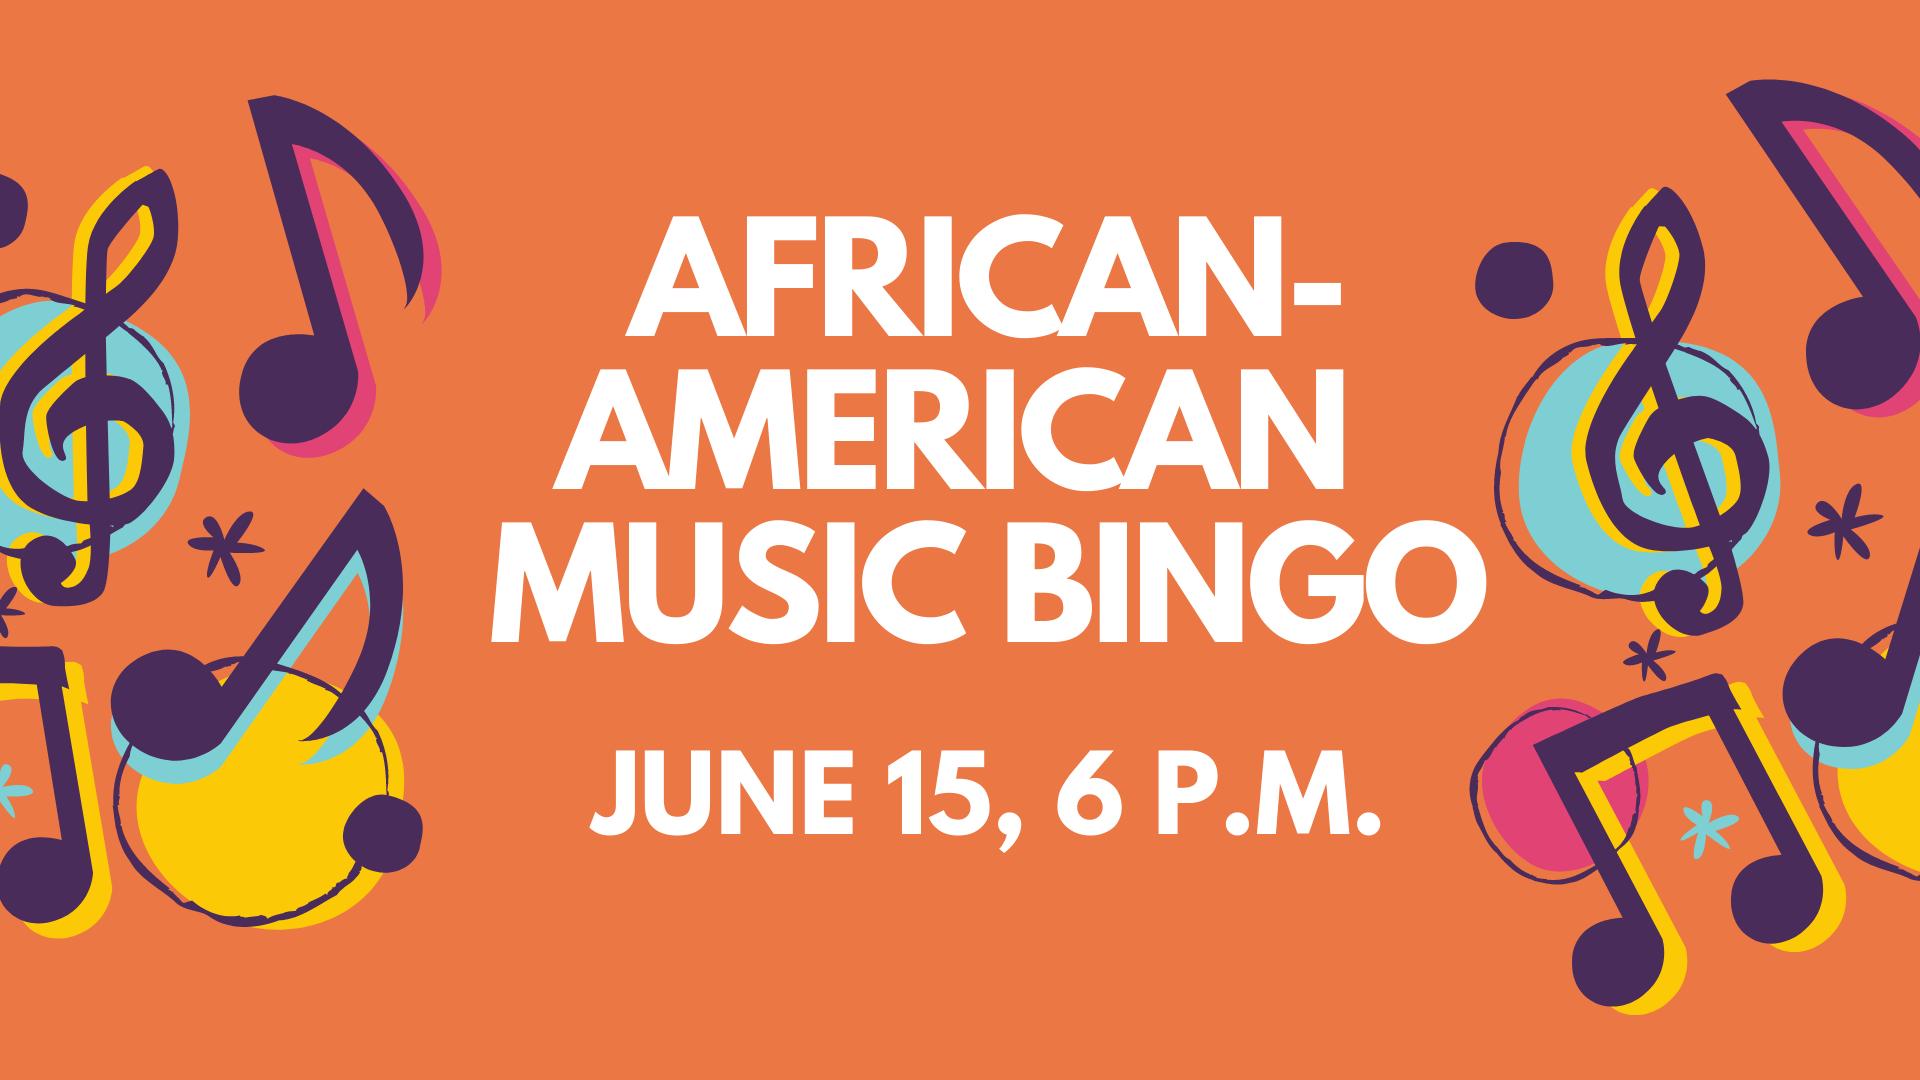 African American Music Bingo